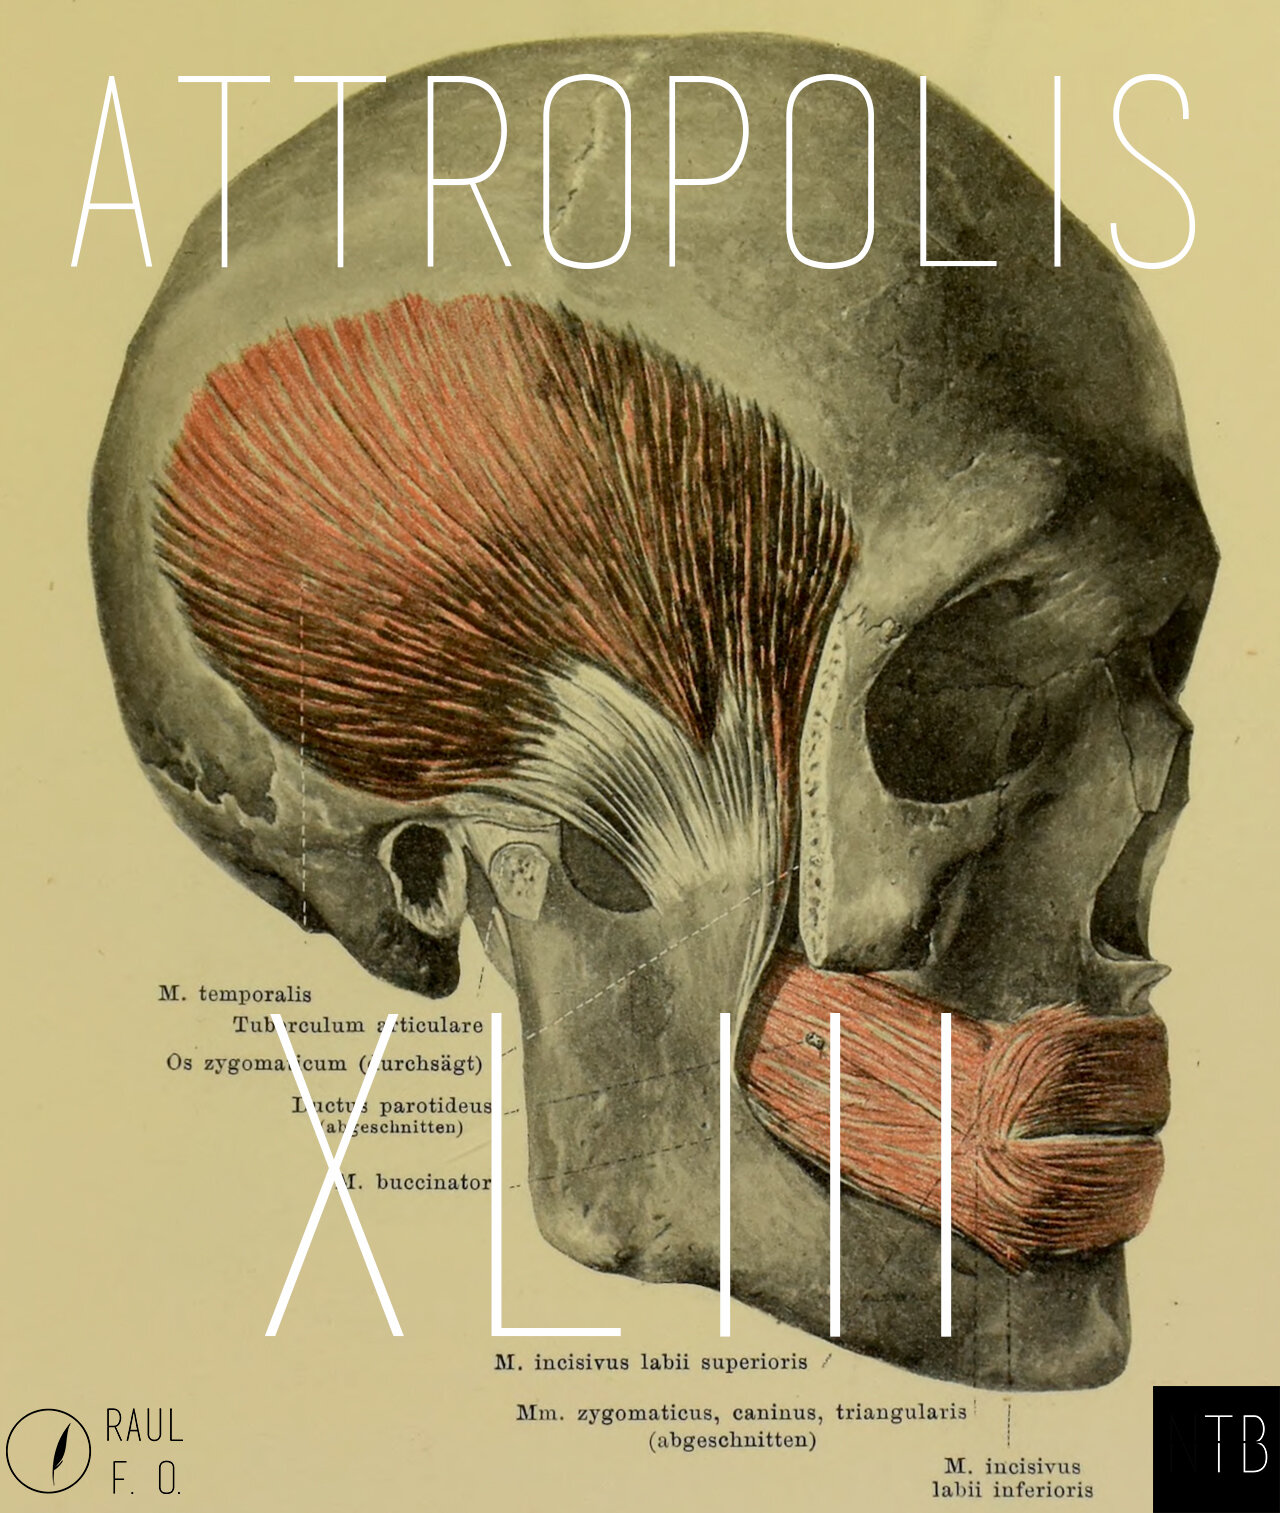 attropolis43.jpg